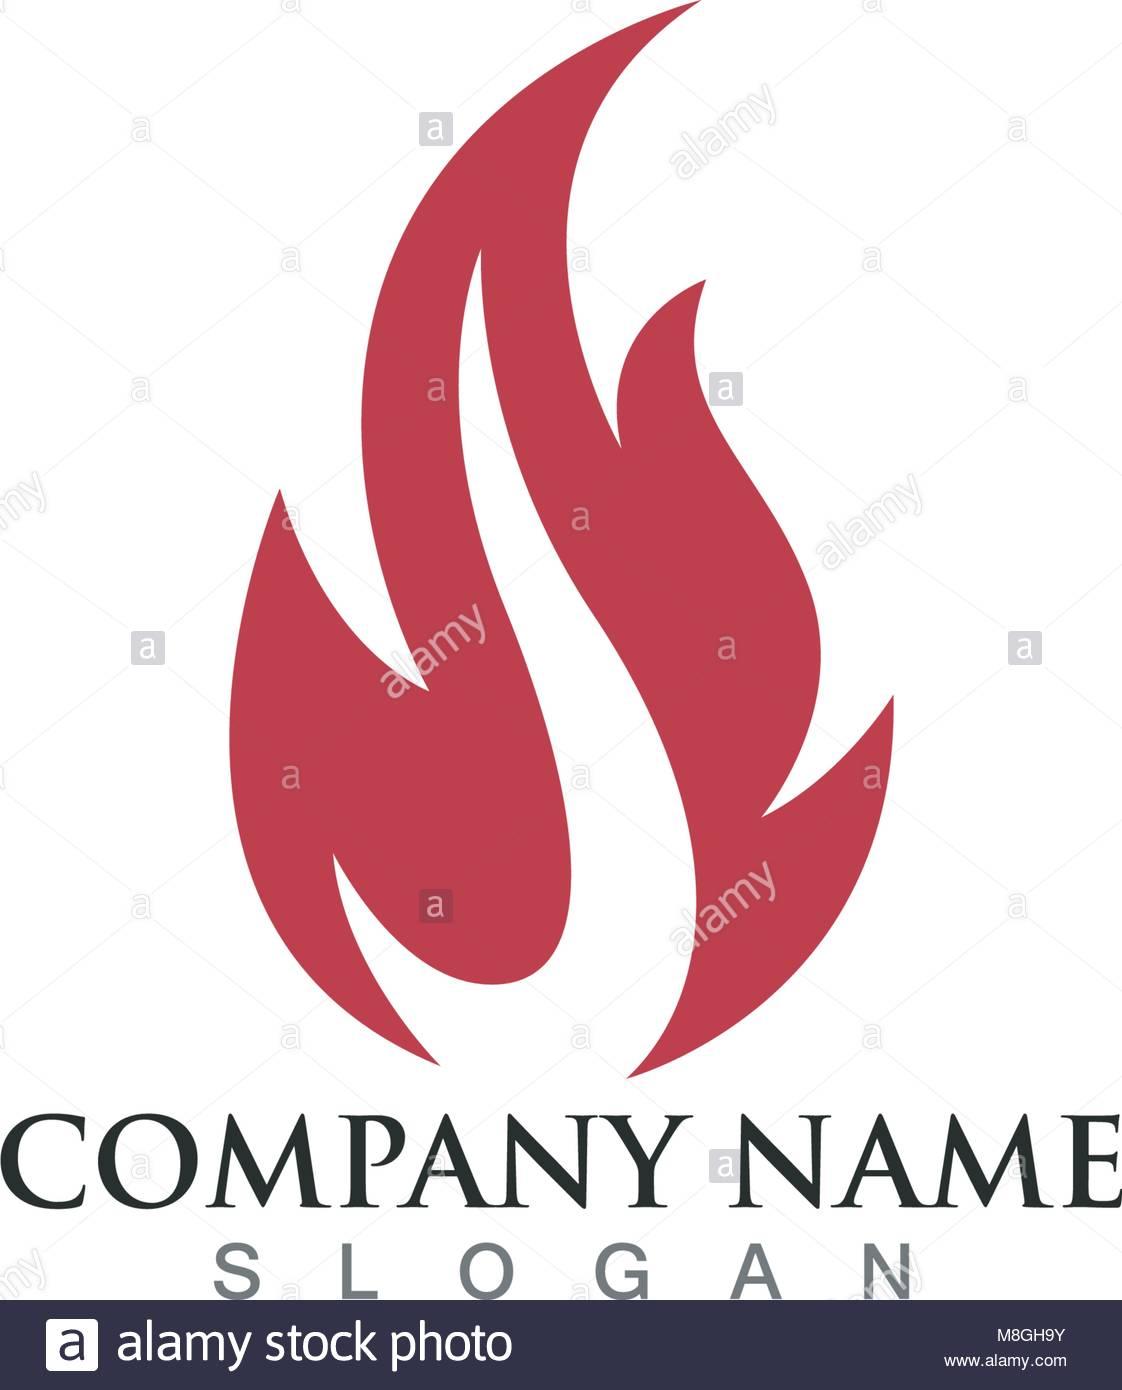 fire flame logo template stock vector art illustration vector